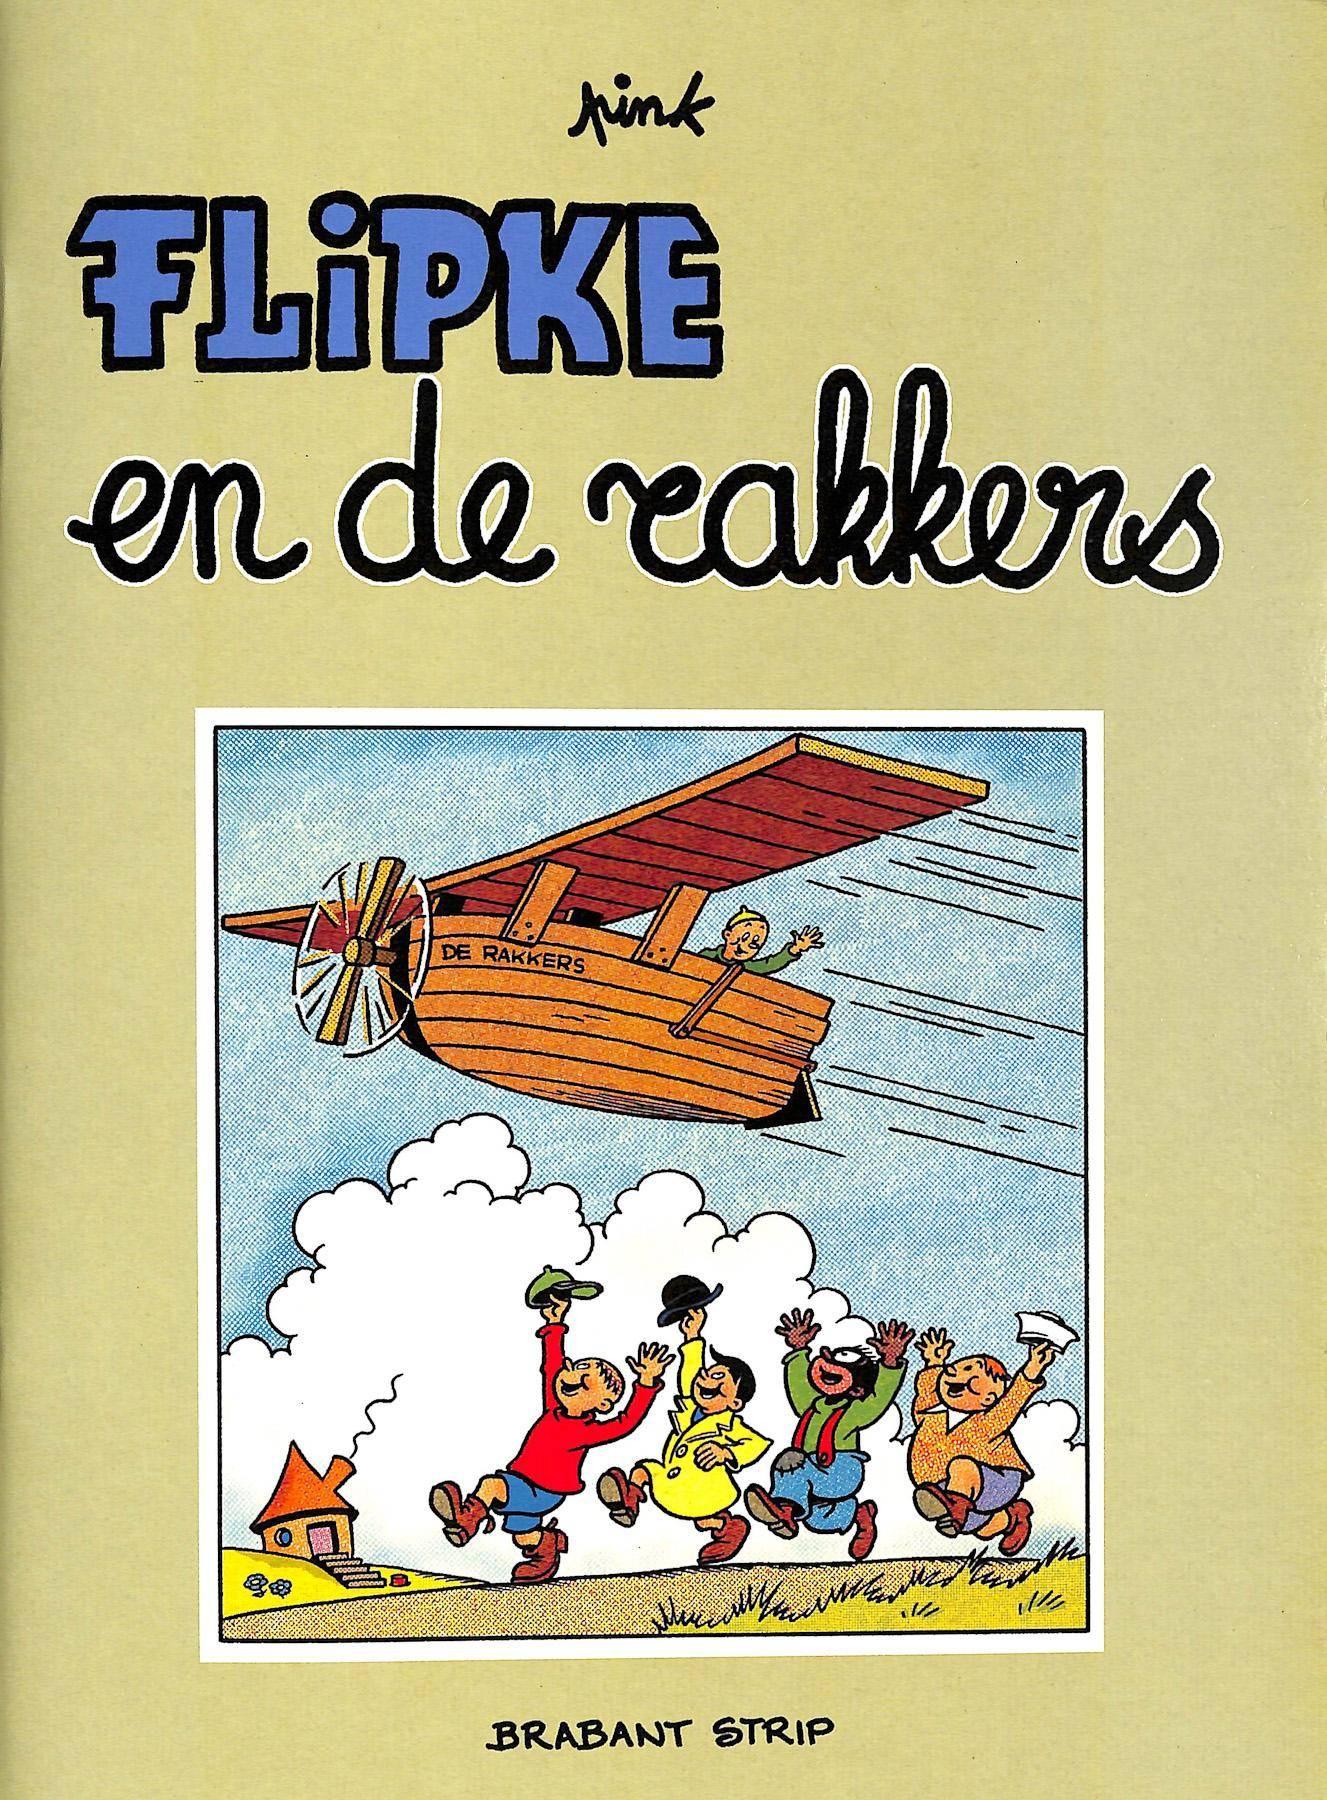 Flipke En De Rakkers - A01 - Flipke En De Rakkers